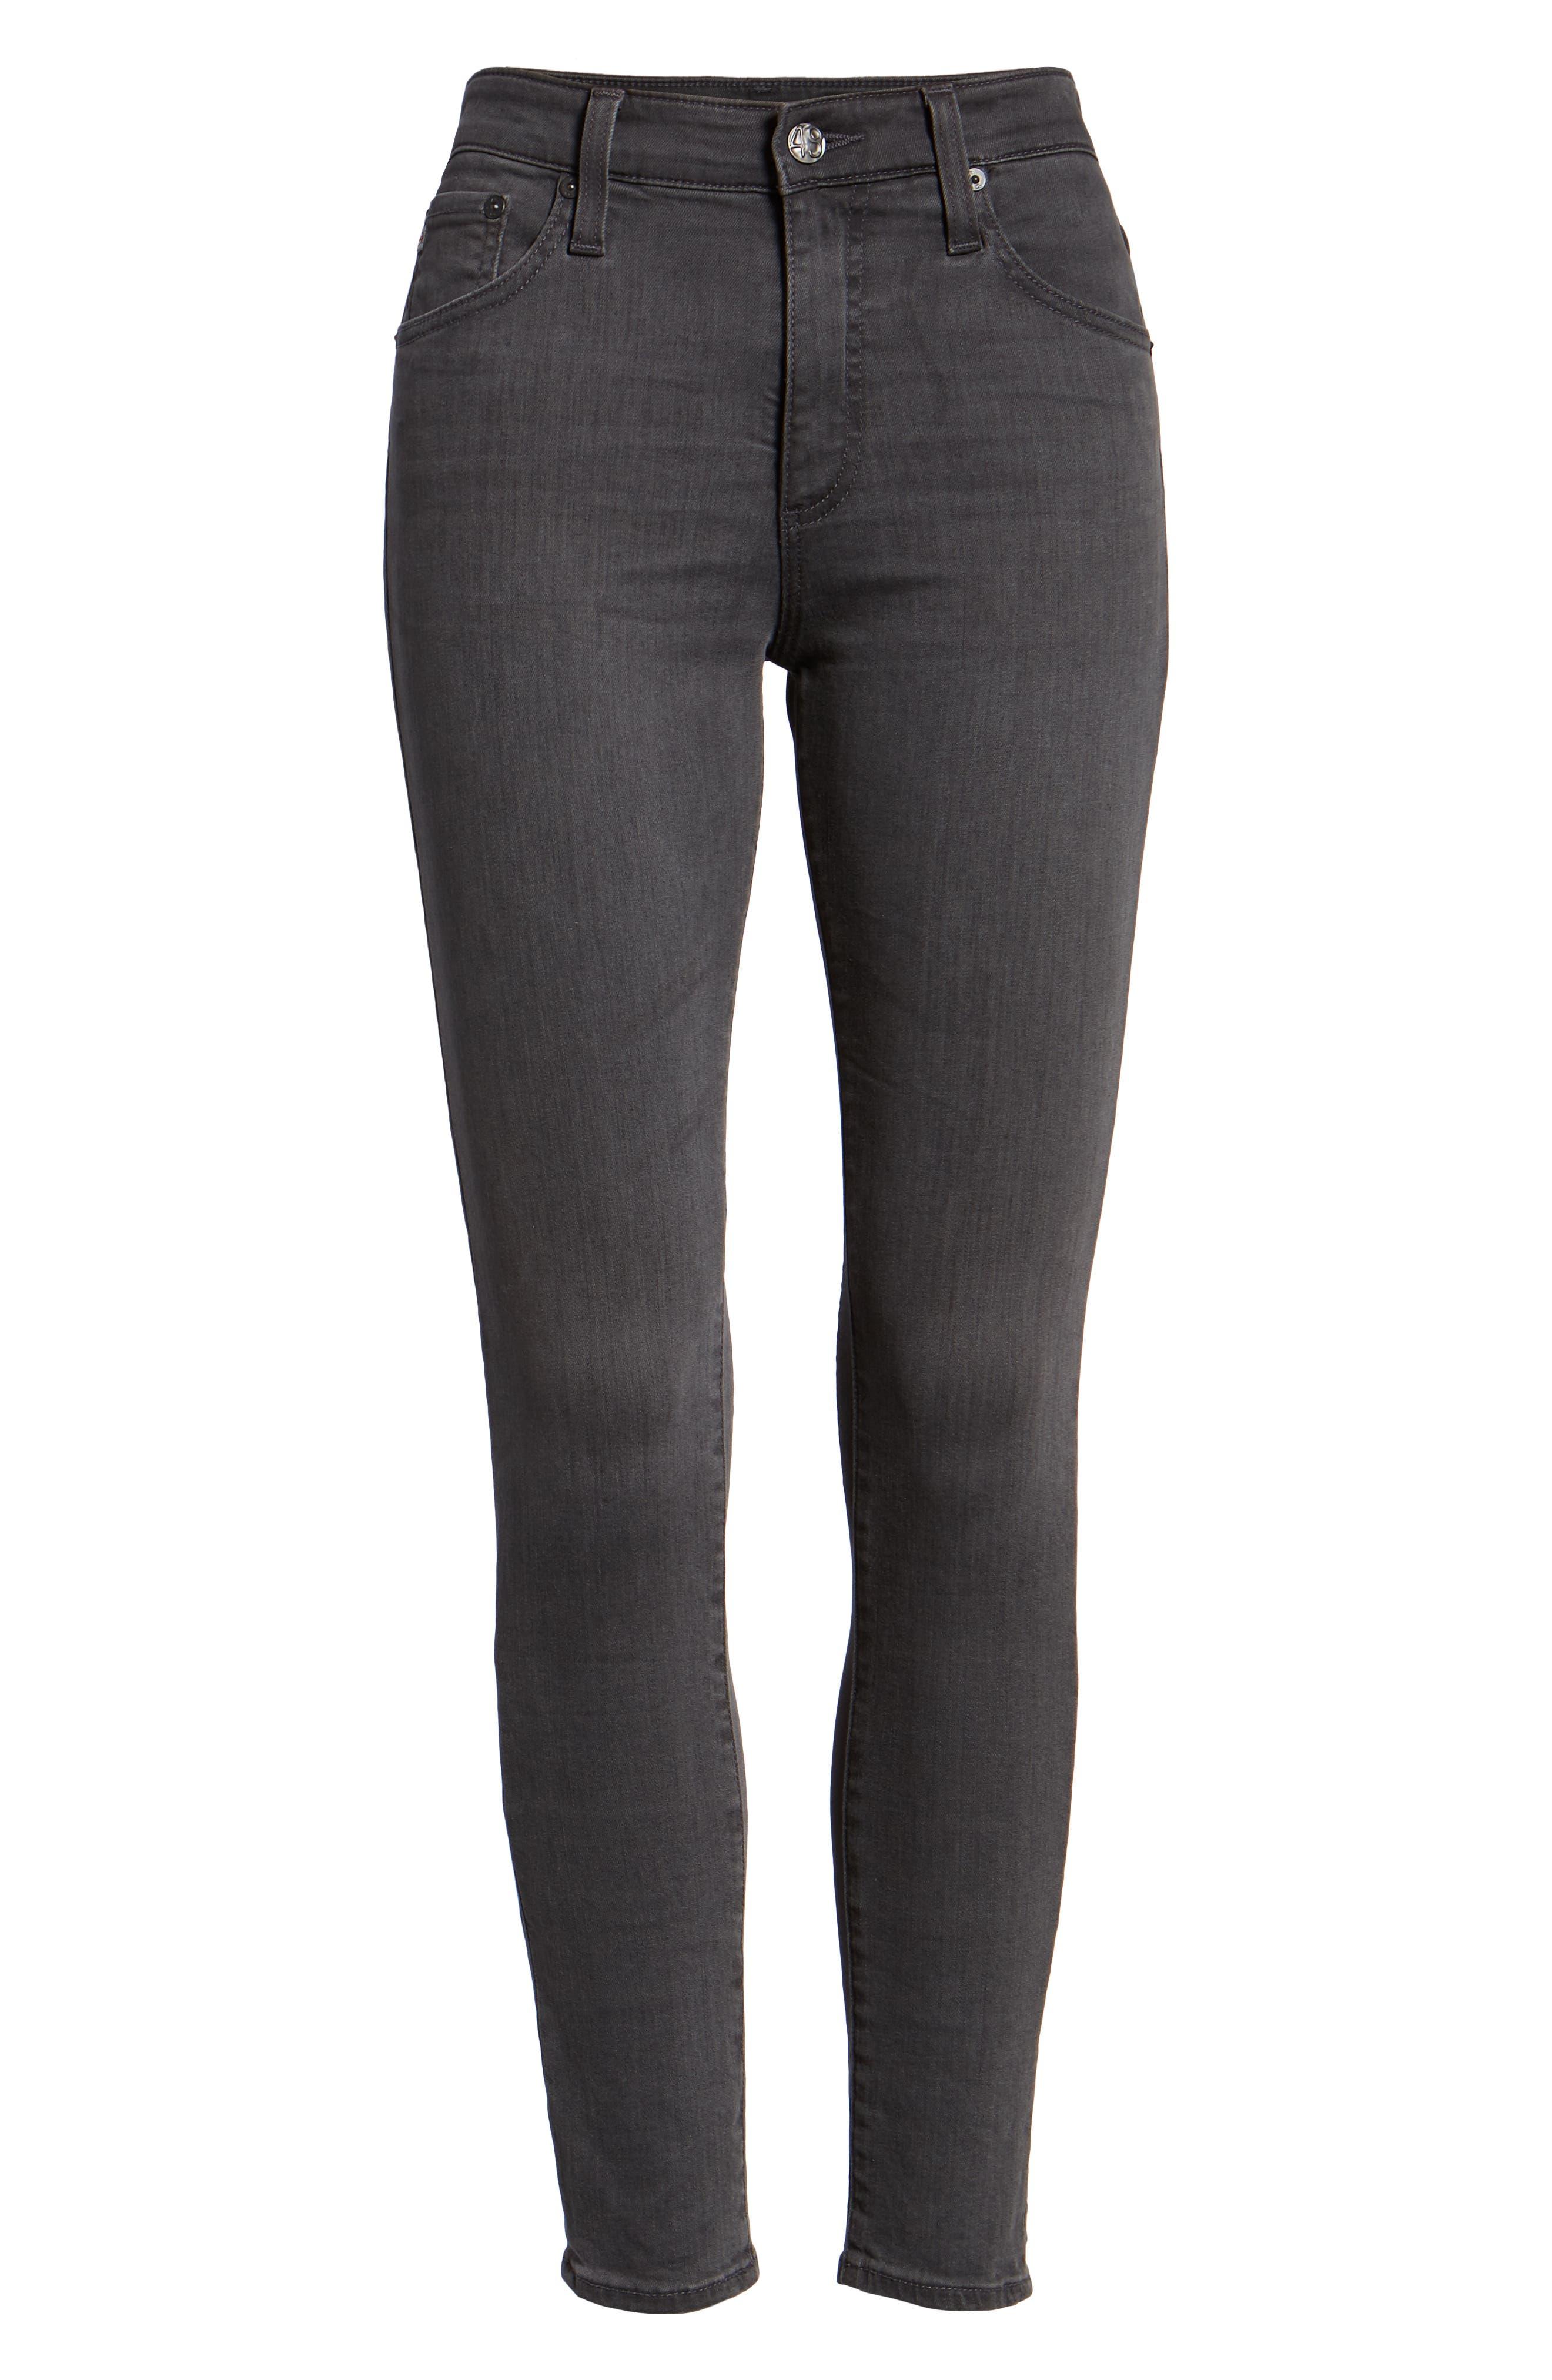 The Farrah High Waist Ankle Skinny Faux Leather Pants,                             Alternate thumbnail 19, color,